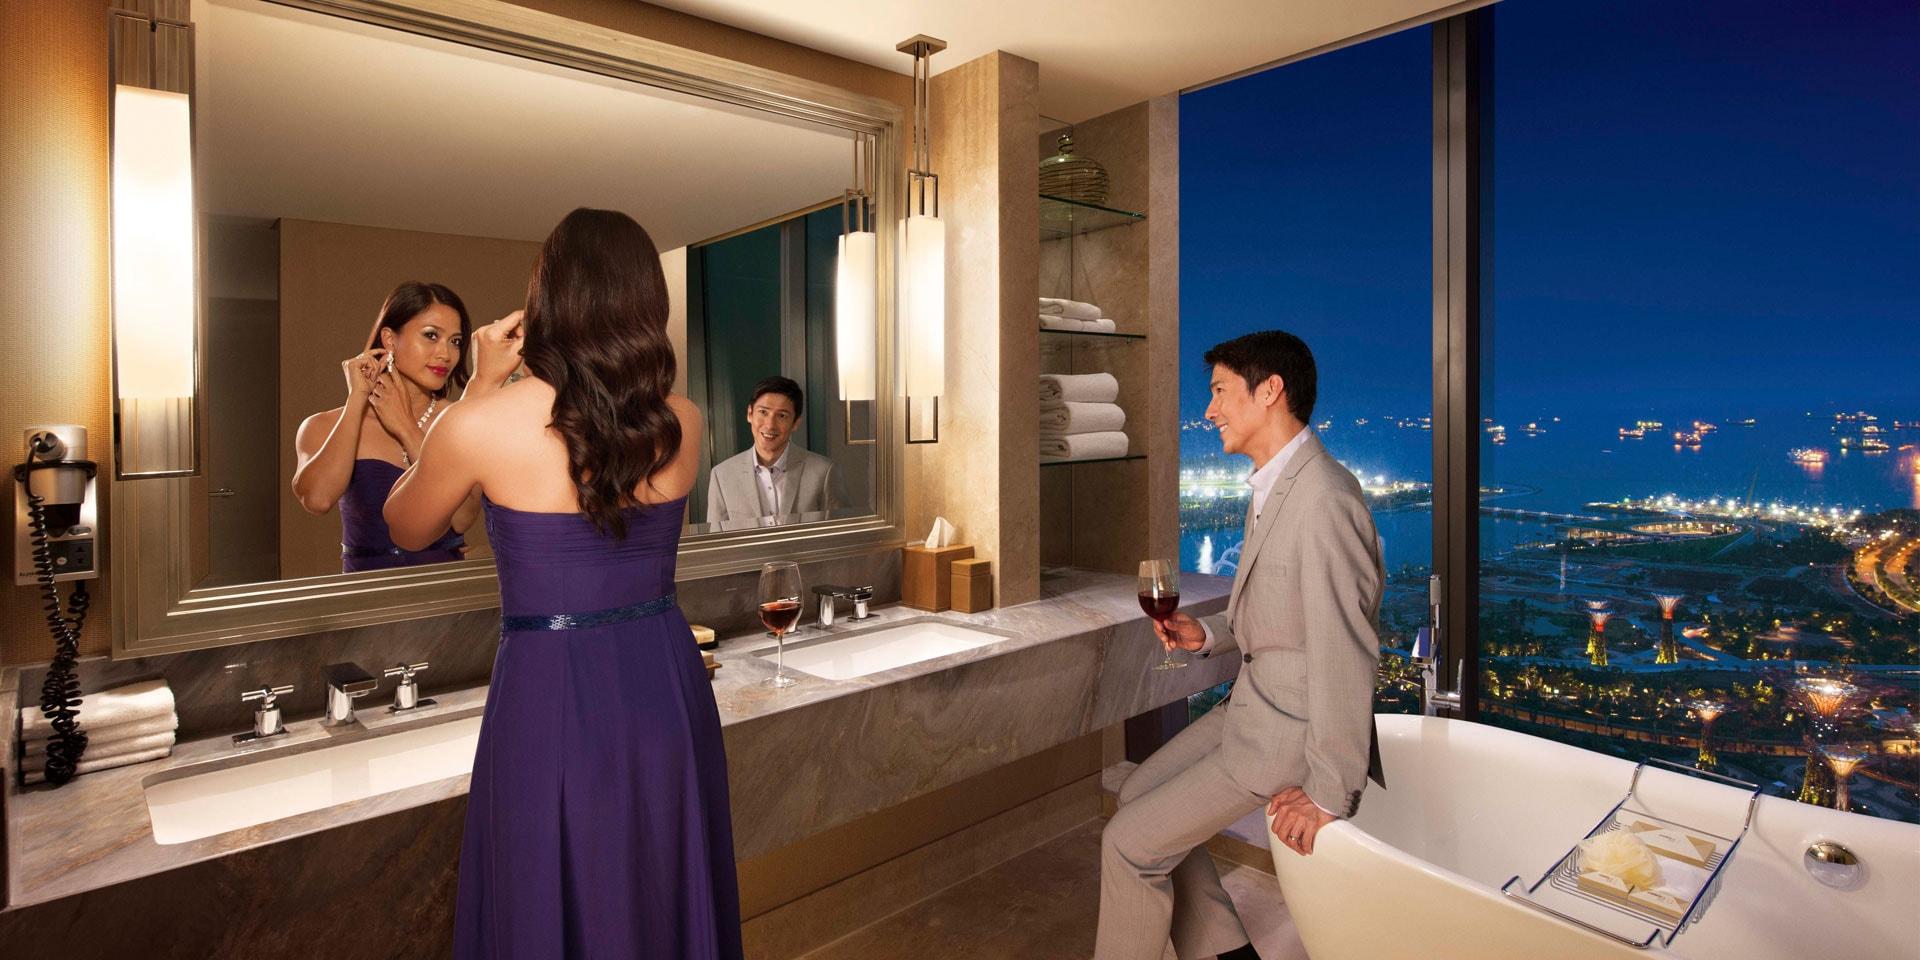 Orchard Suite Bathroom At Marina Bay Sands